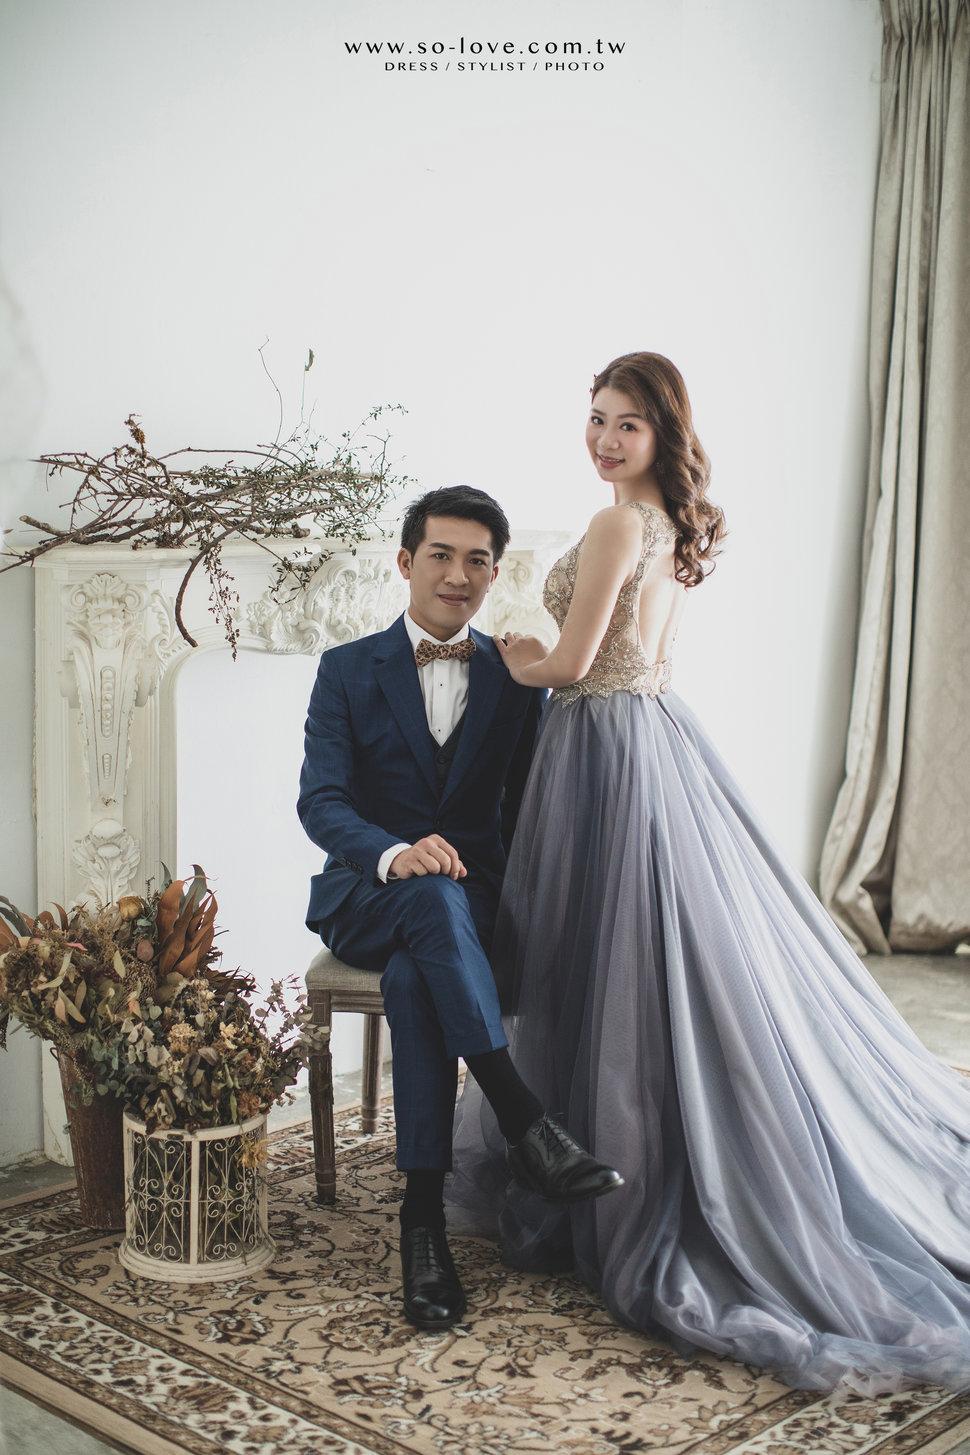 RYAN8171 - So.Love Wedding 樂樂蕾絲《結婚吧》